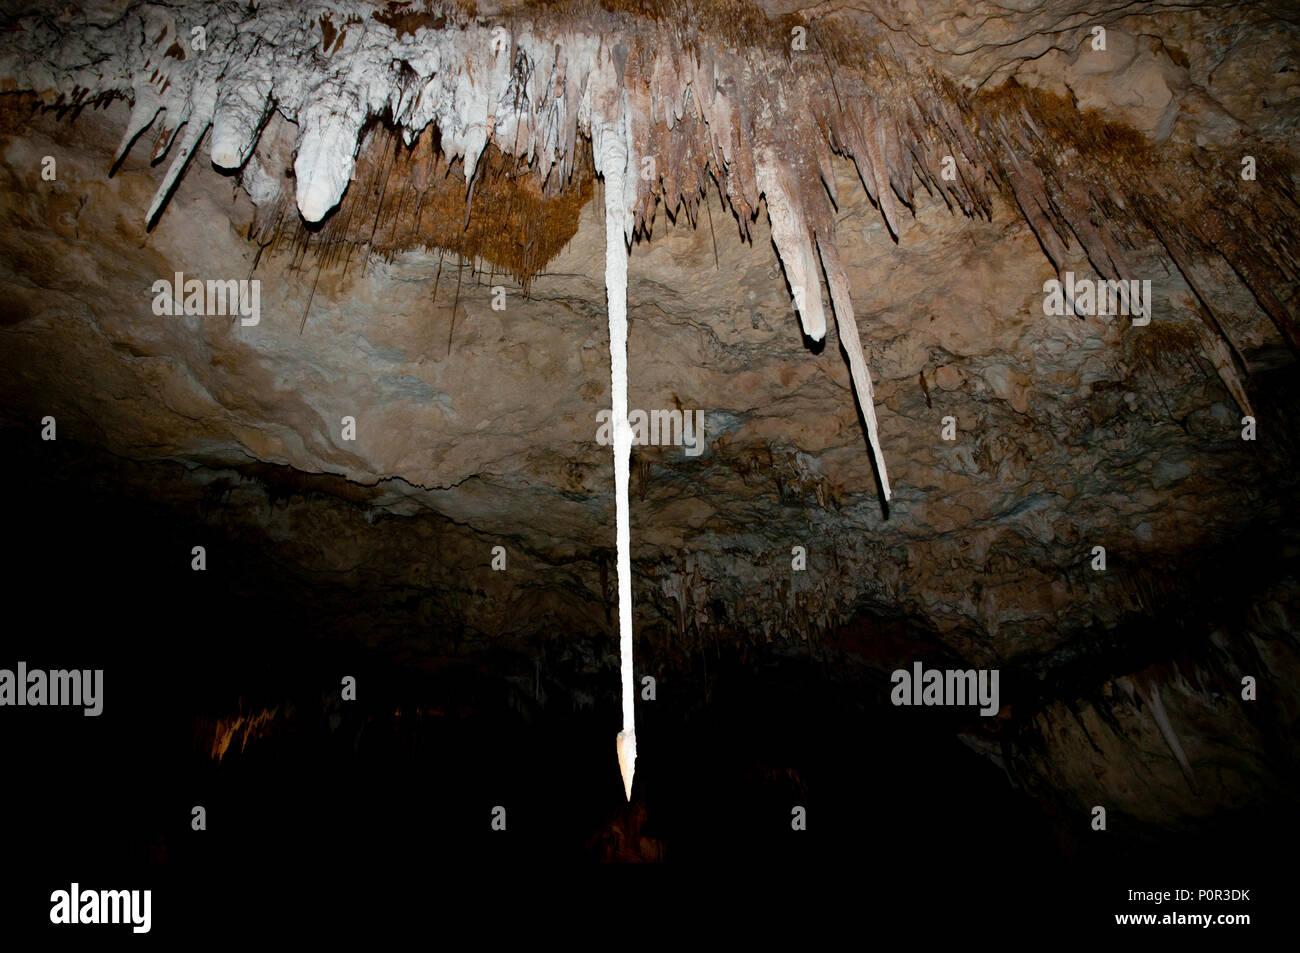 Jewel Cave - Western Australia - Stock Image